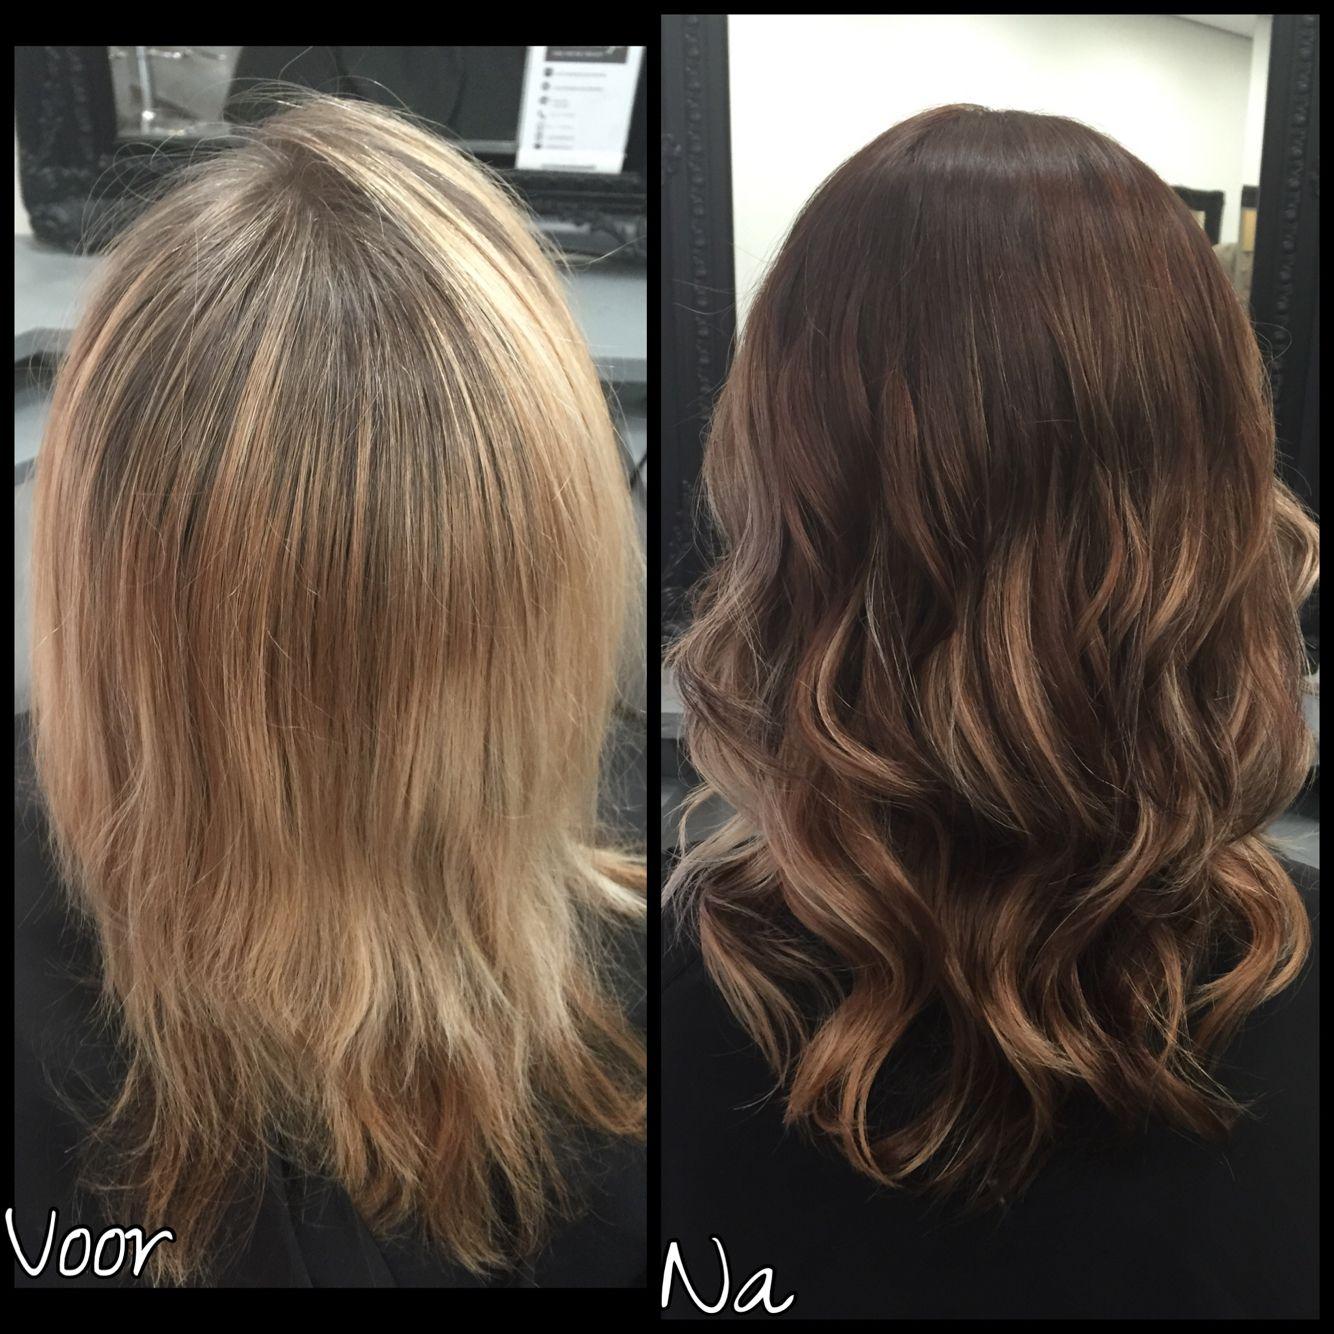 Reverse Balayage Adding Dark Instead Of Light Reverse Balayage Light Hair Hair Inspo Color